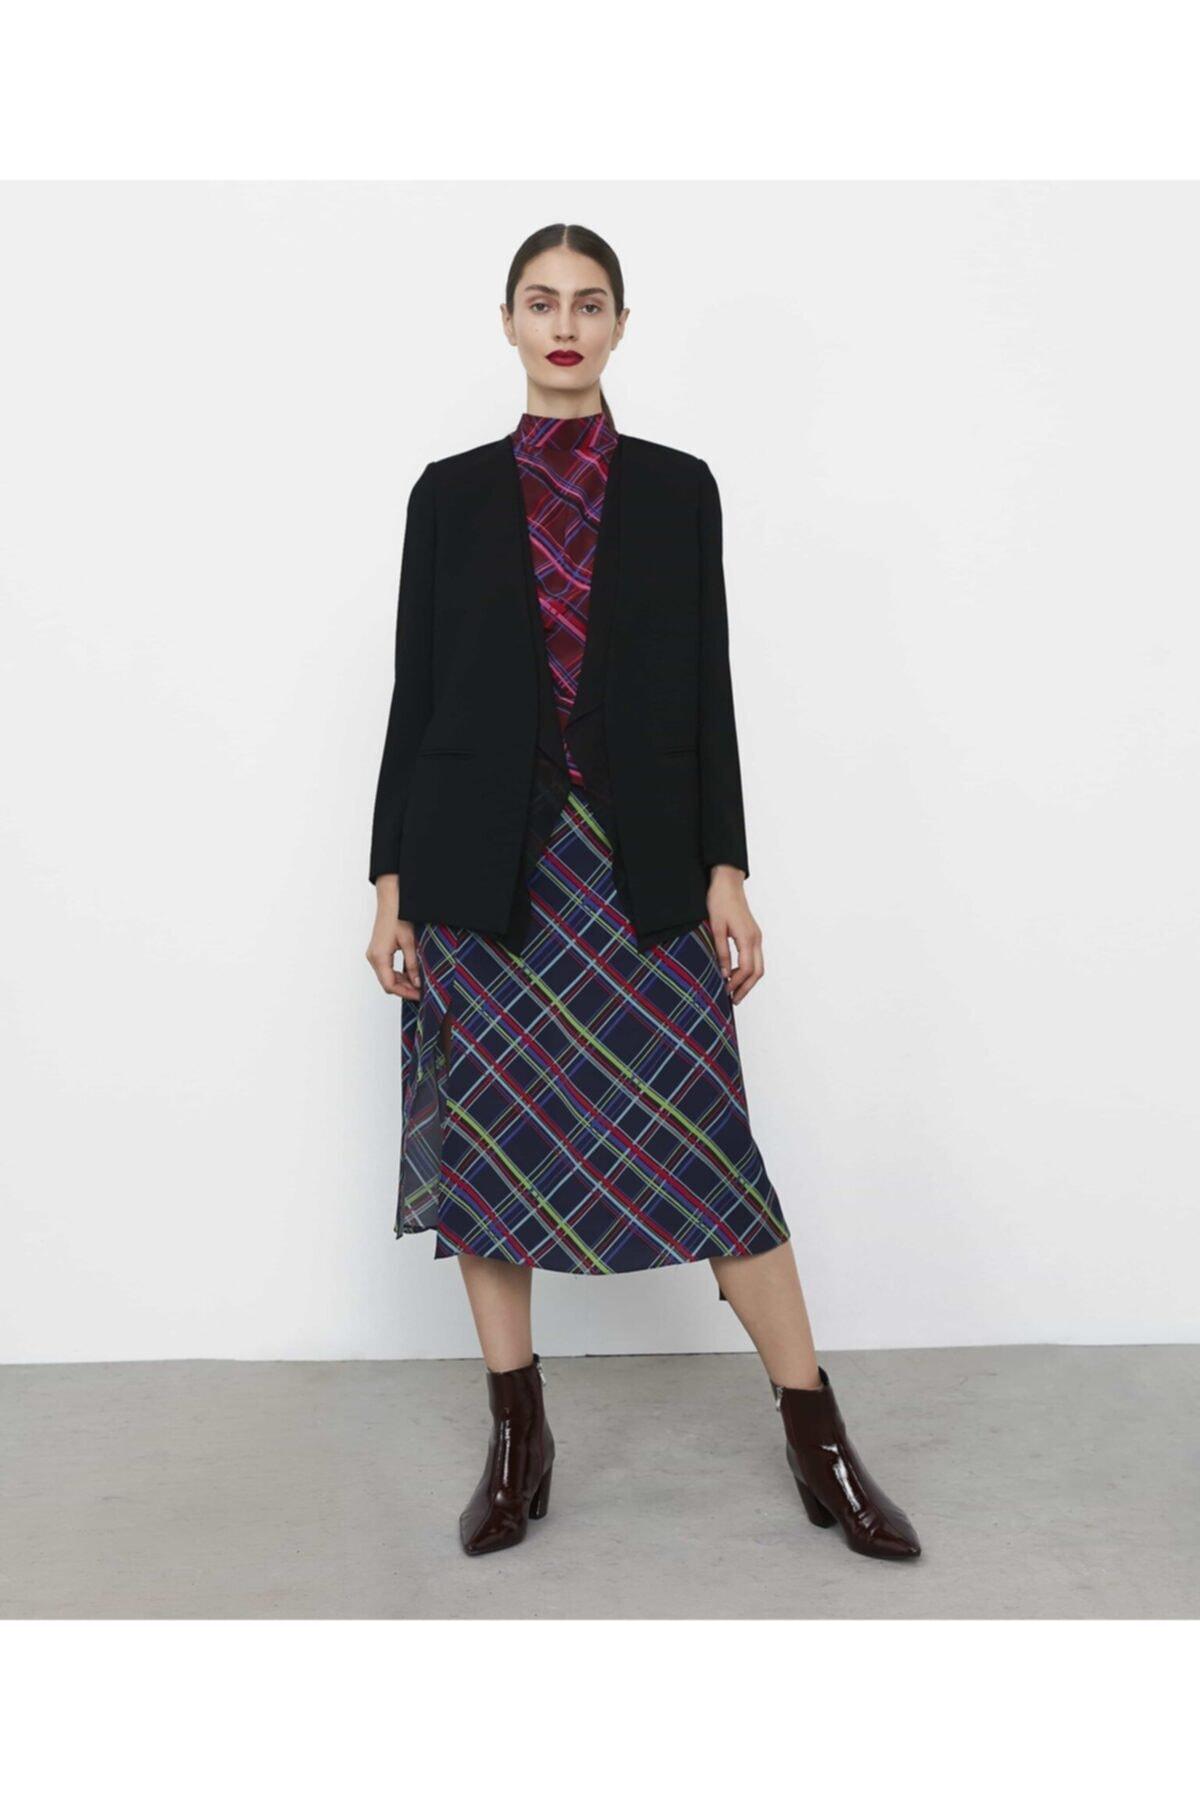 İpekyol Kadın Siyah Şifon Mixli Ceket IW6190005075001 1